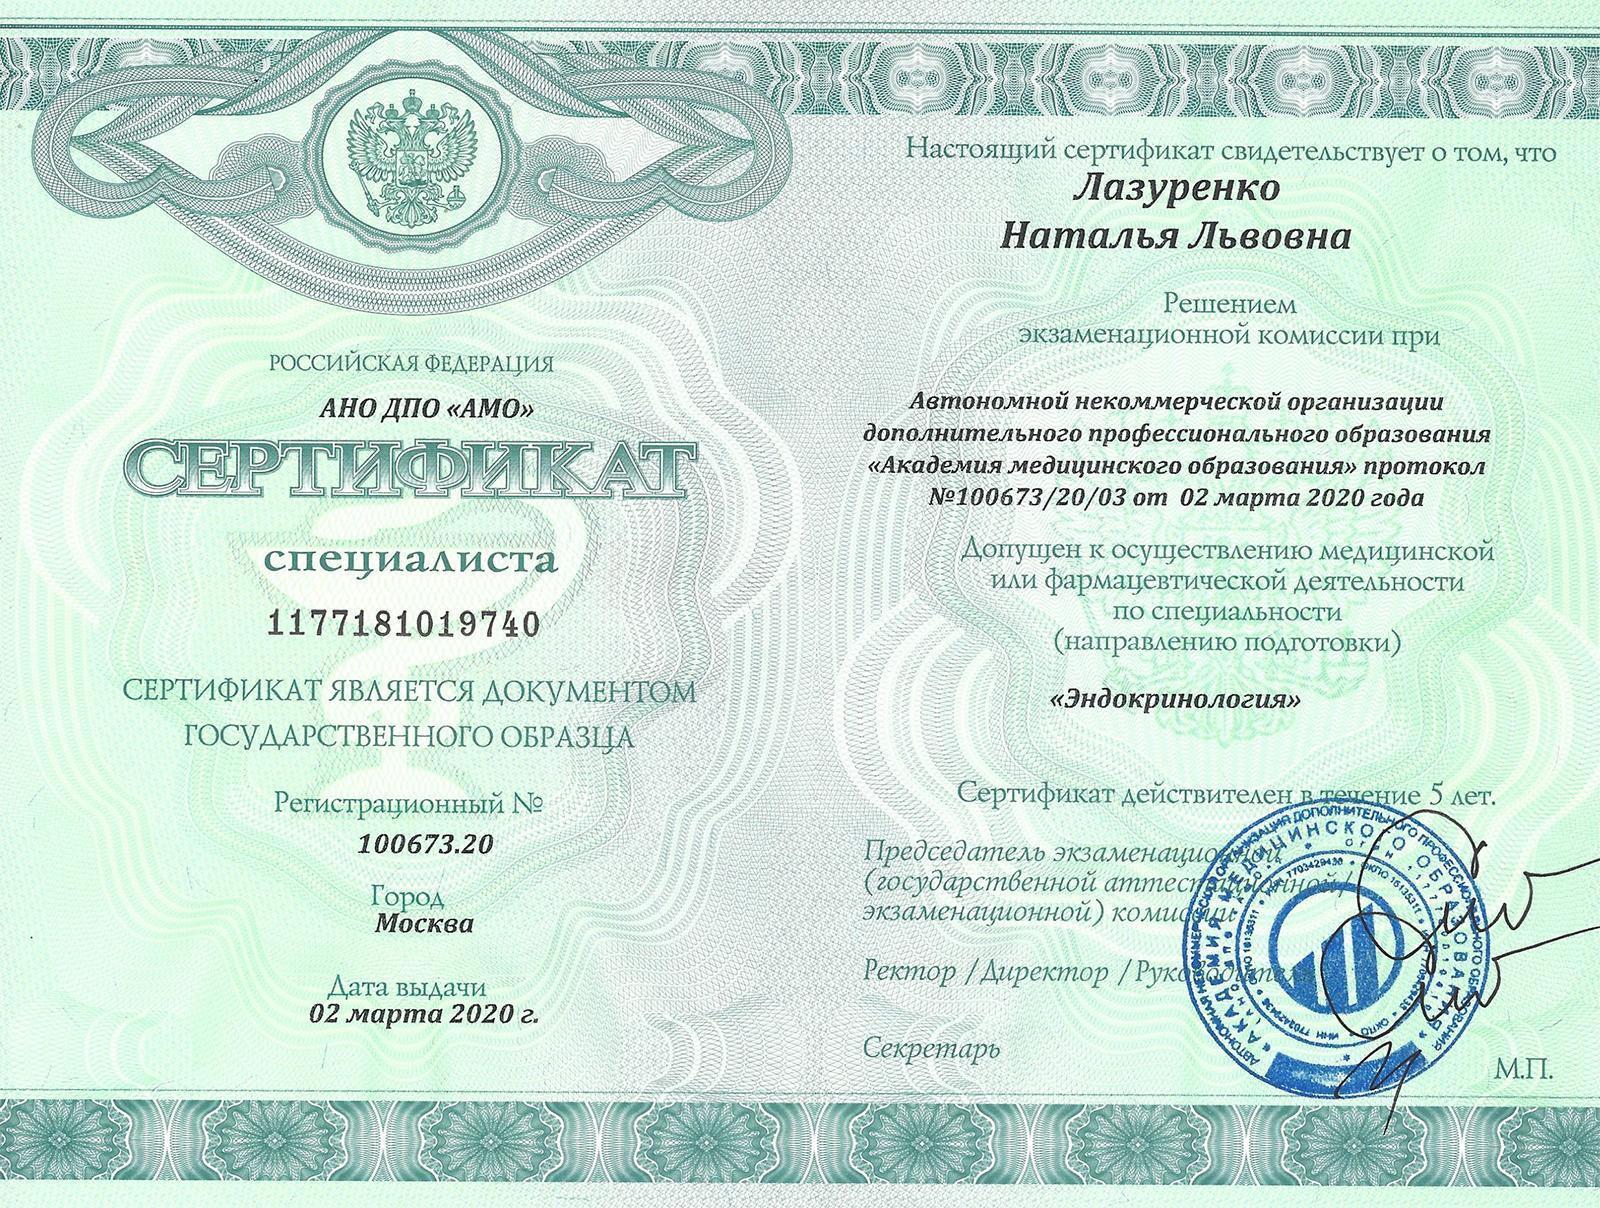 Документы Лазуренко Н.Л.-1